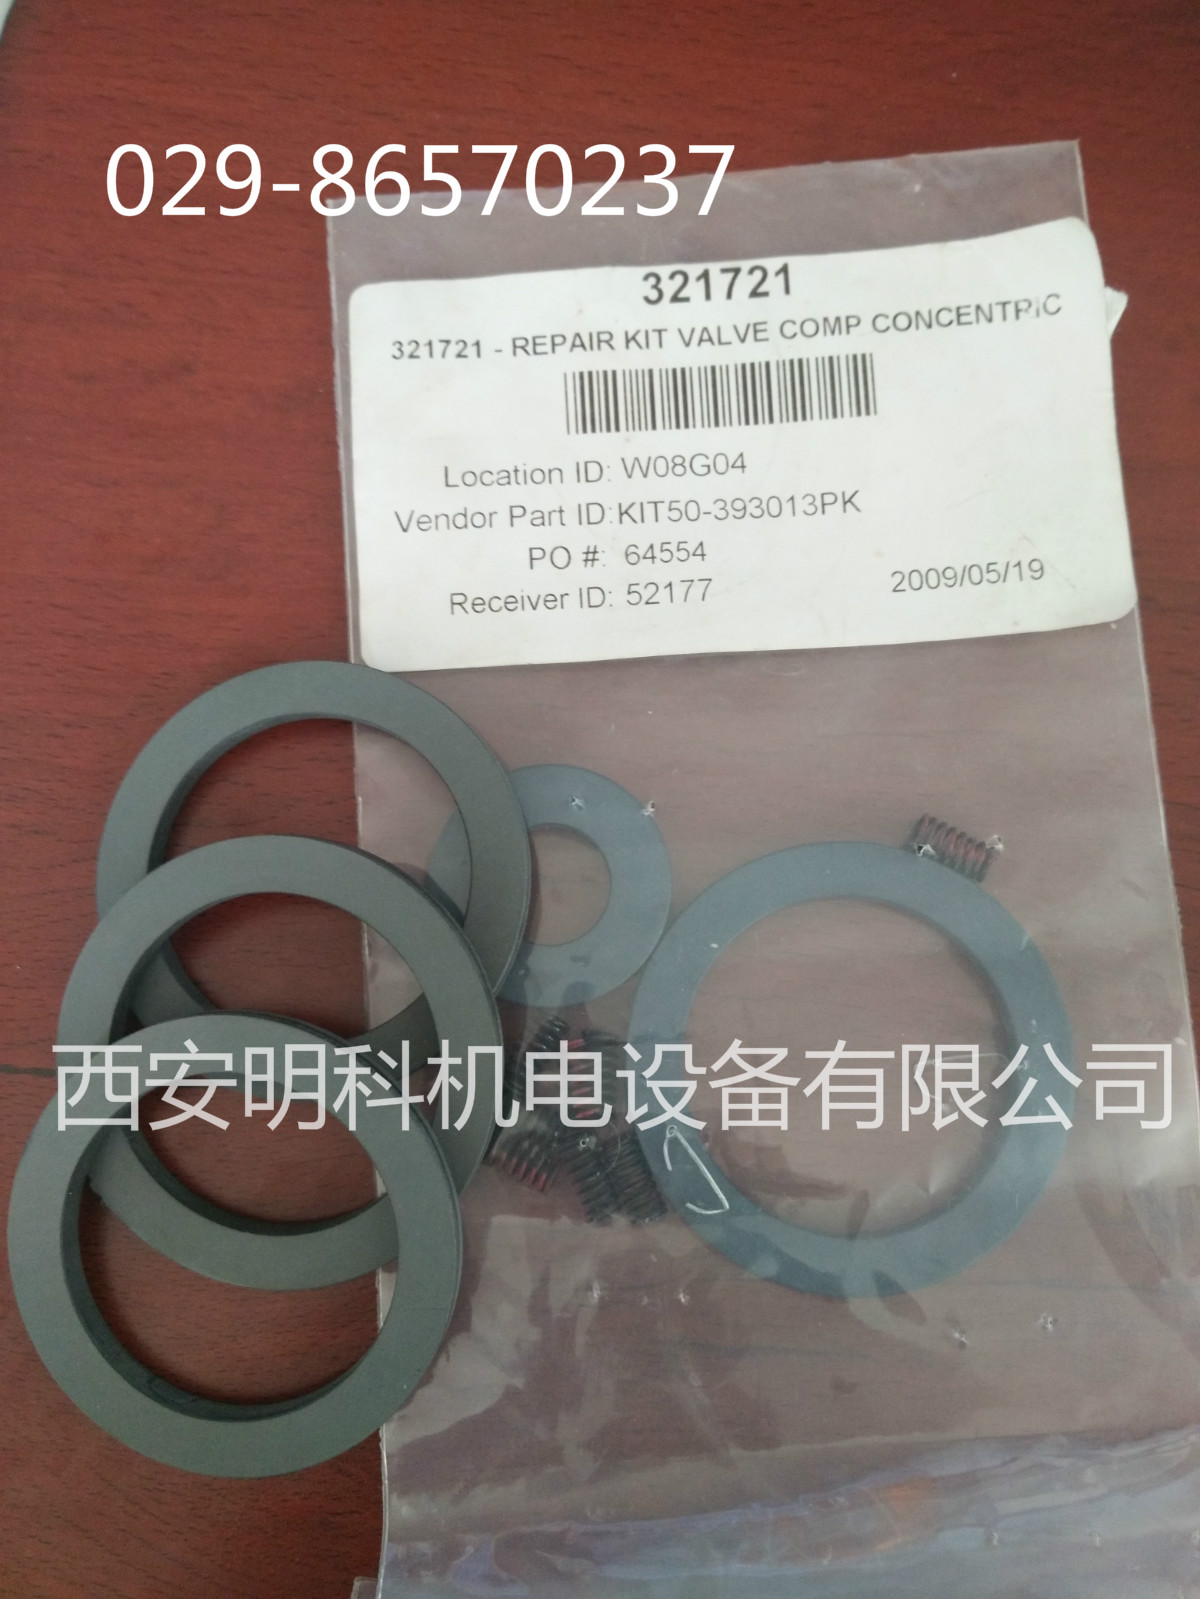 IMW安姆達壓縮機備件包哪里質量好-西安優惠的安姆達壓縮機維修包哪里買